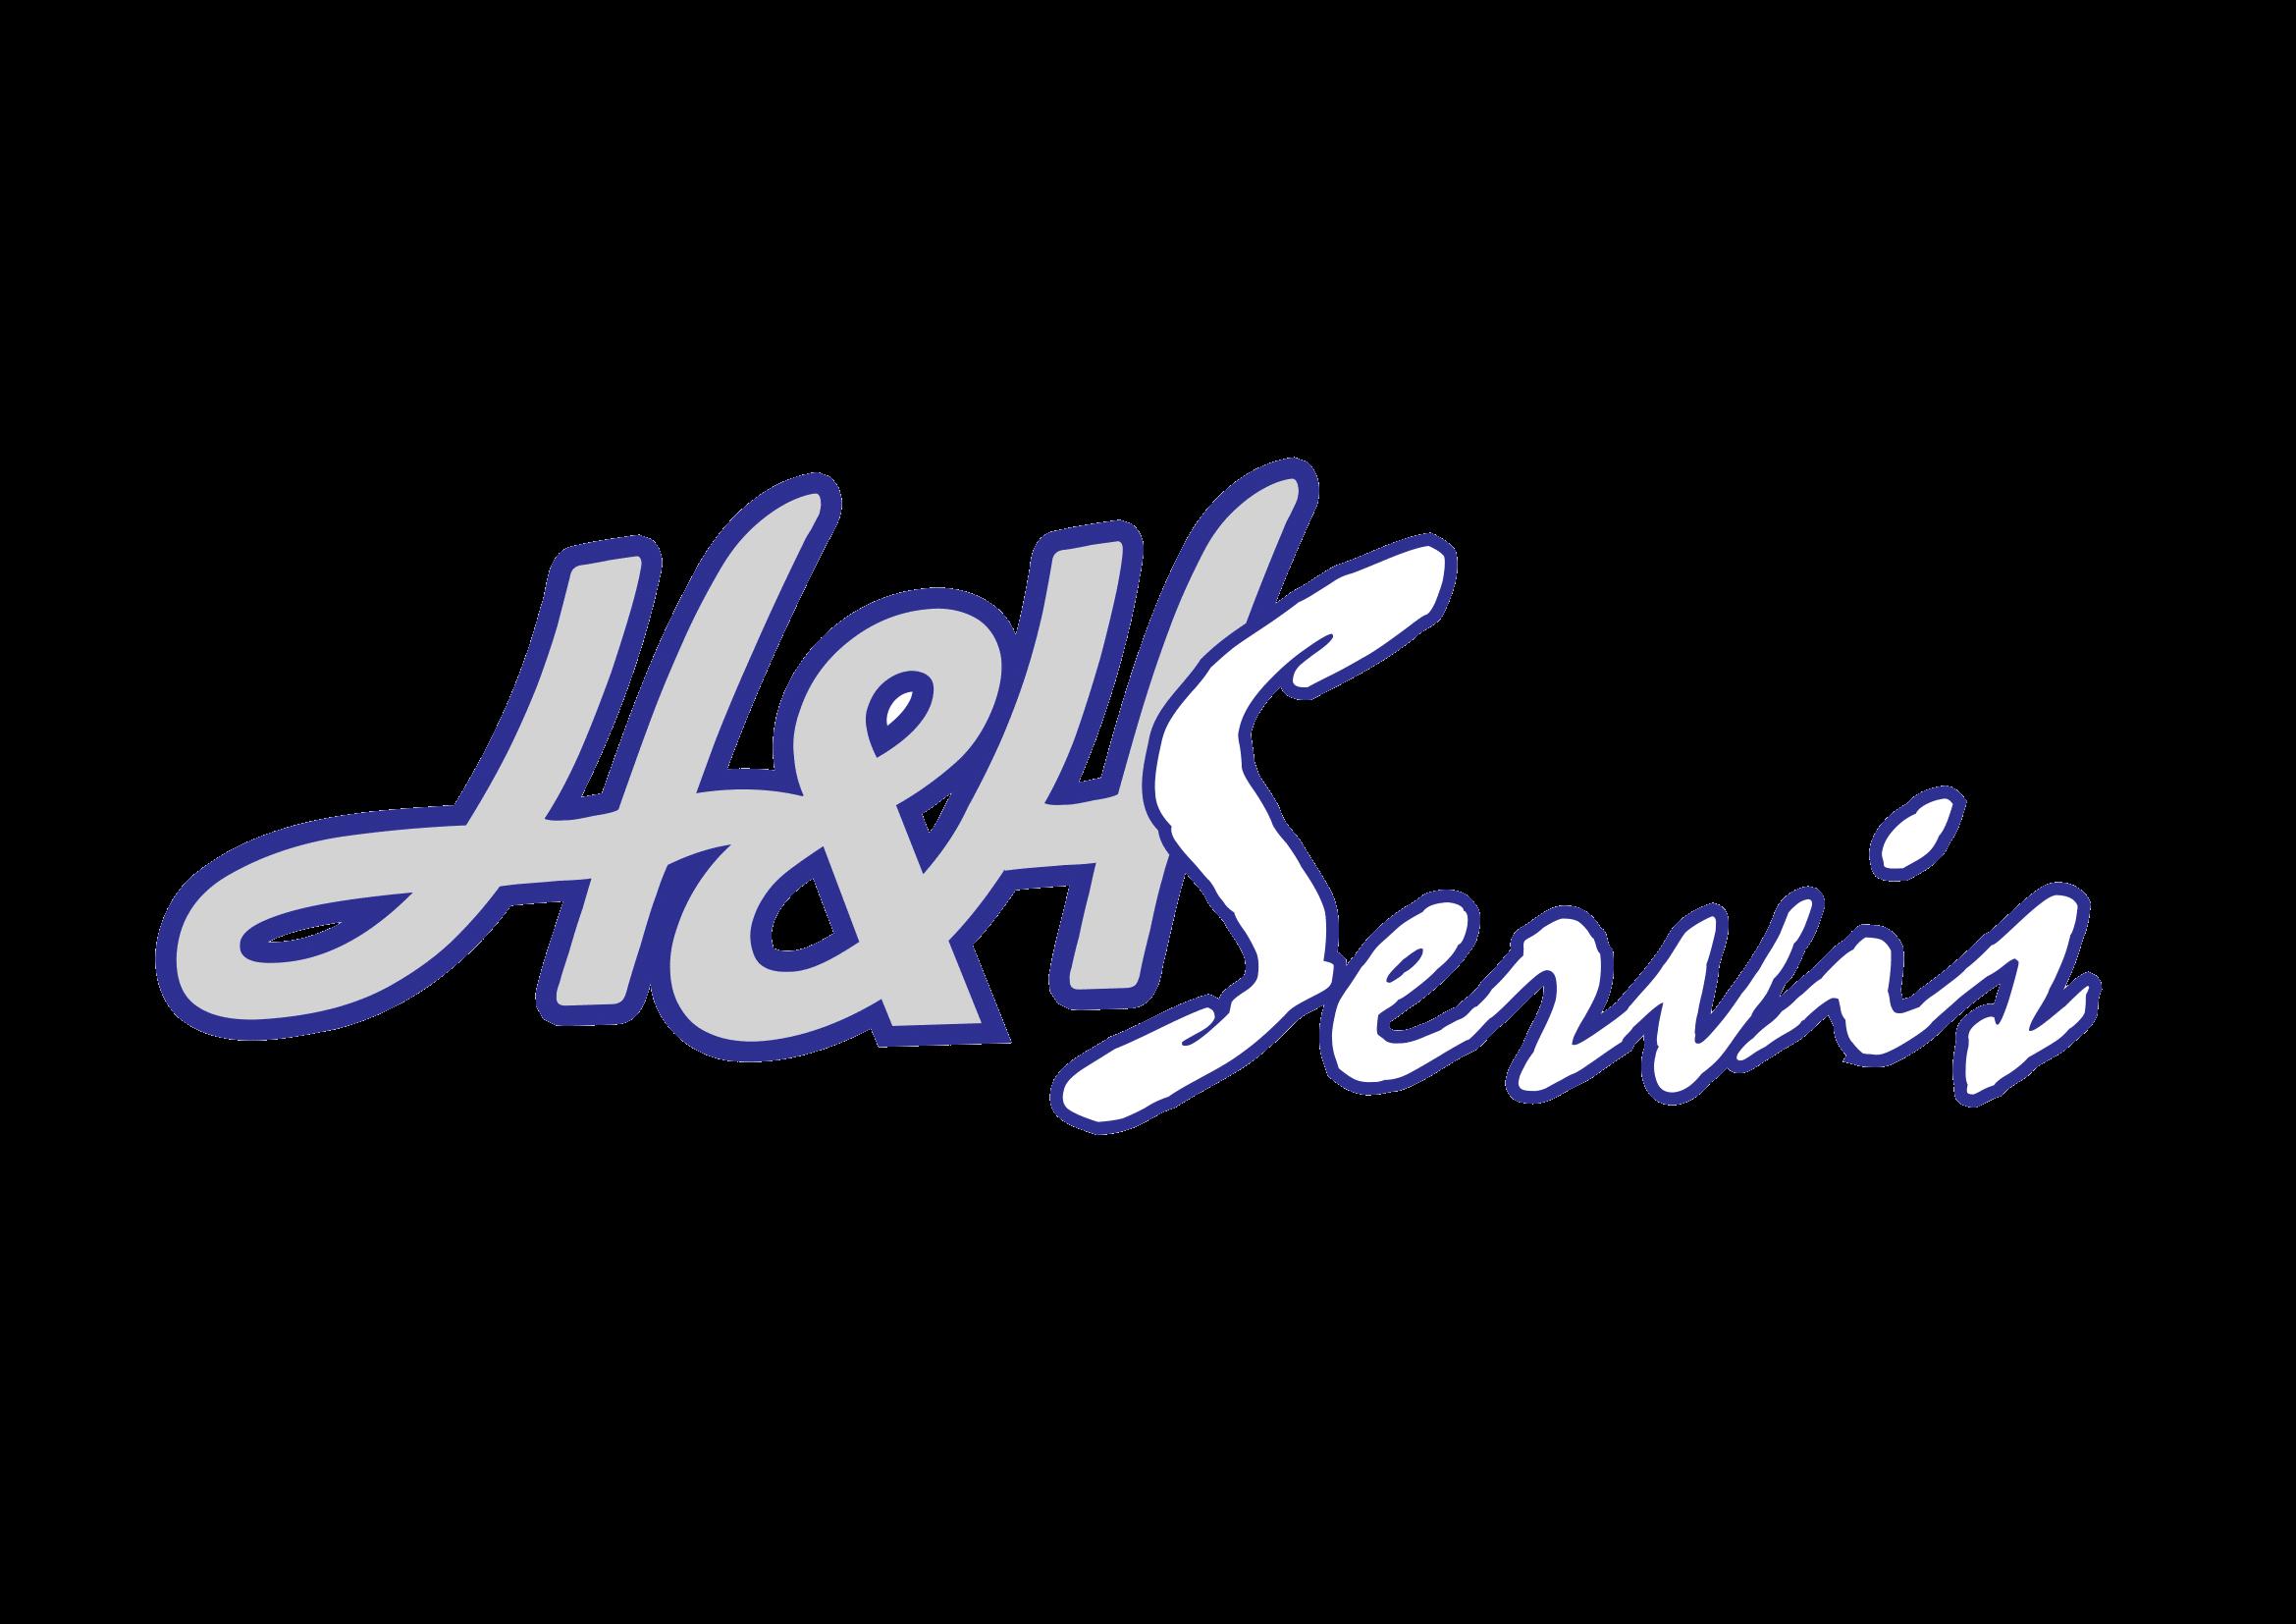 Havelka servis